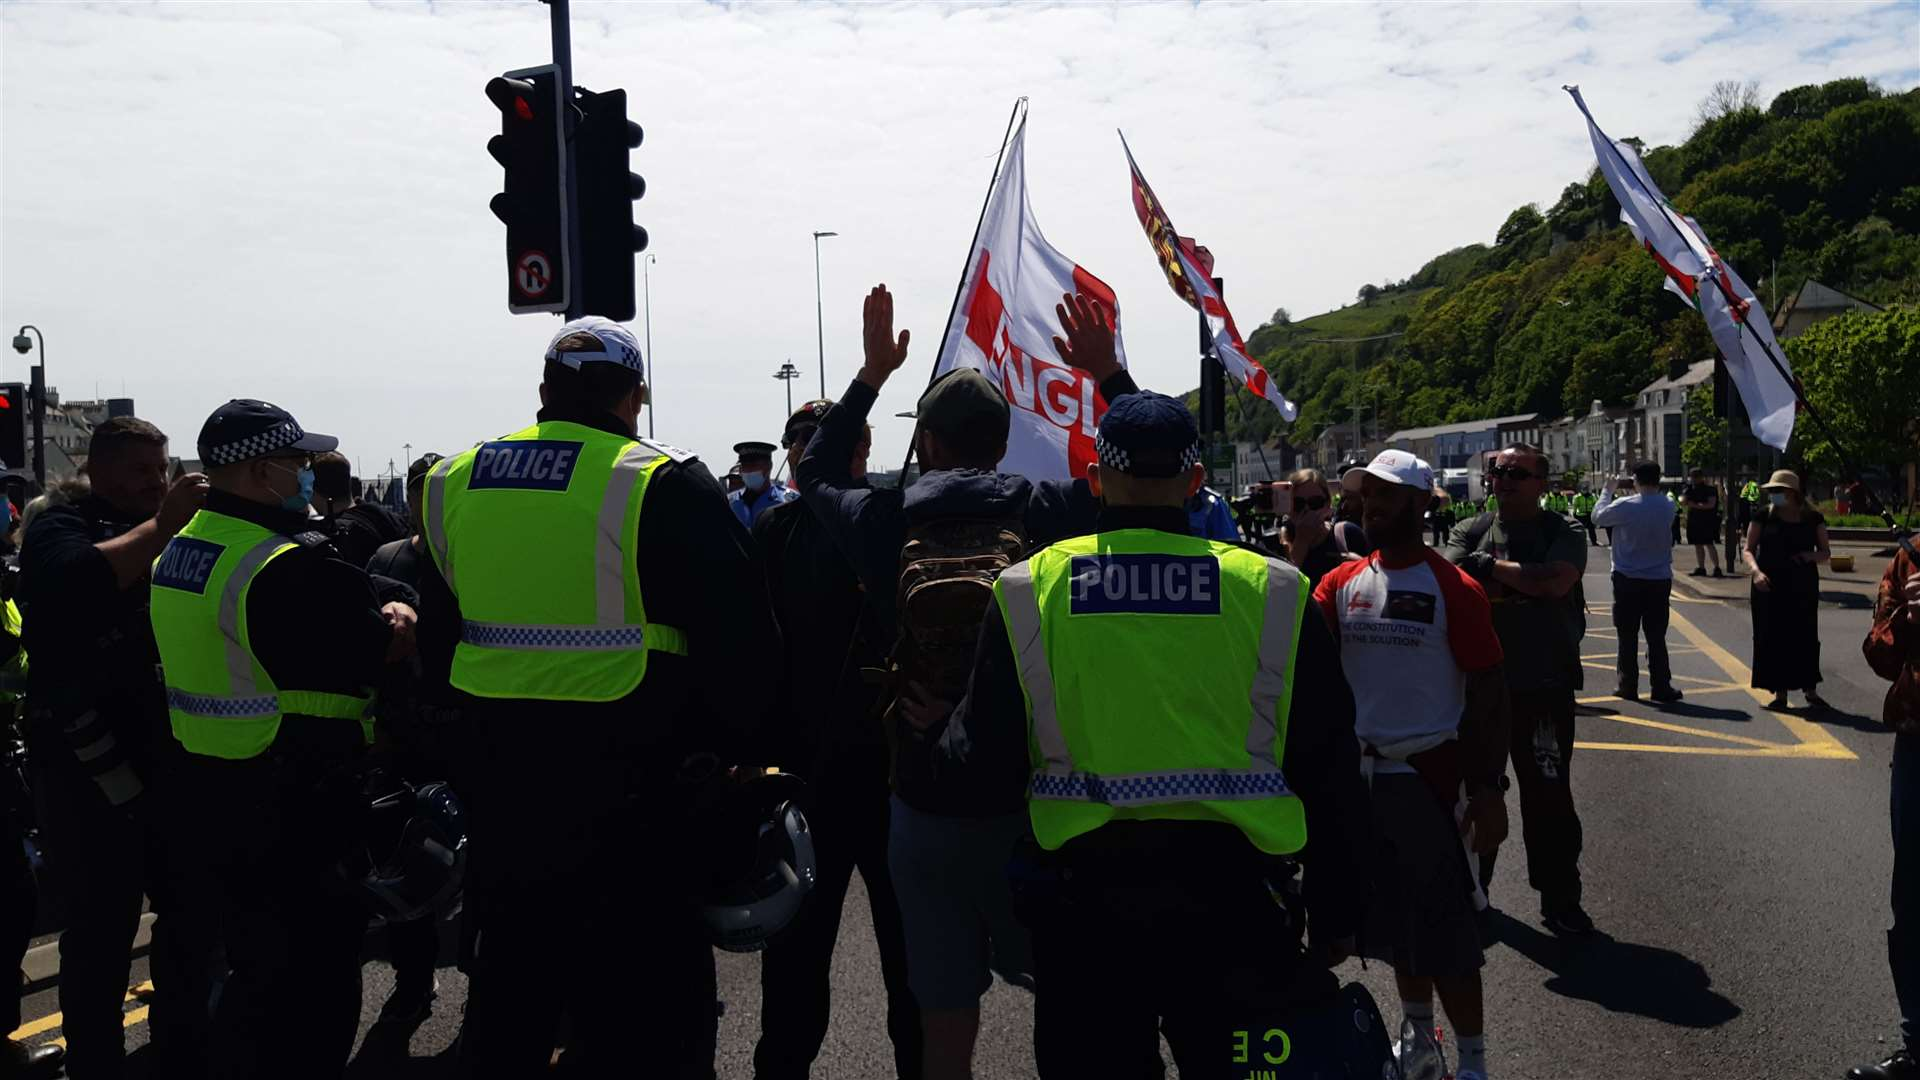 The protest at Snargate Street Photo: Sam Lennon